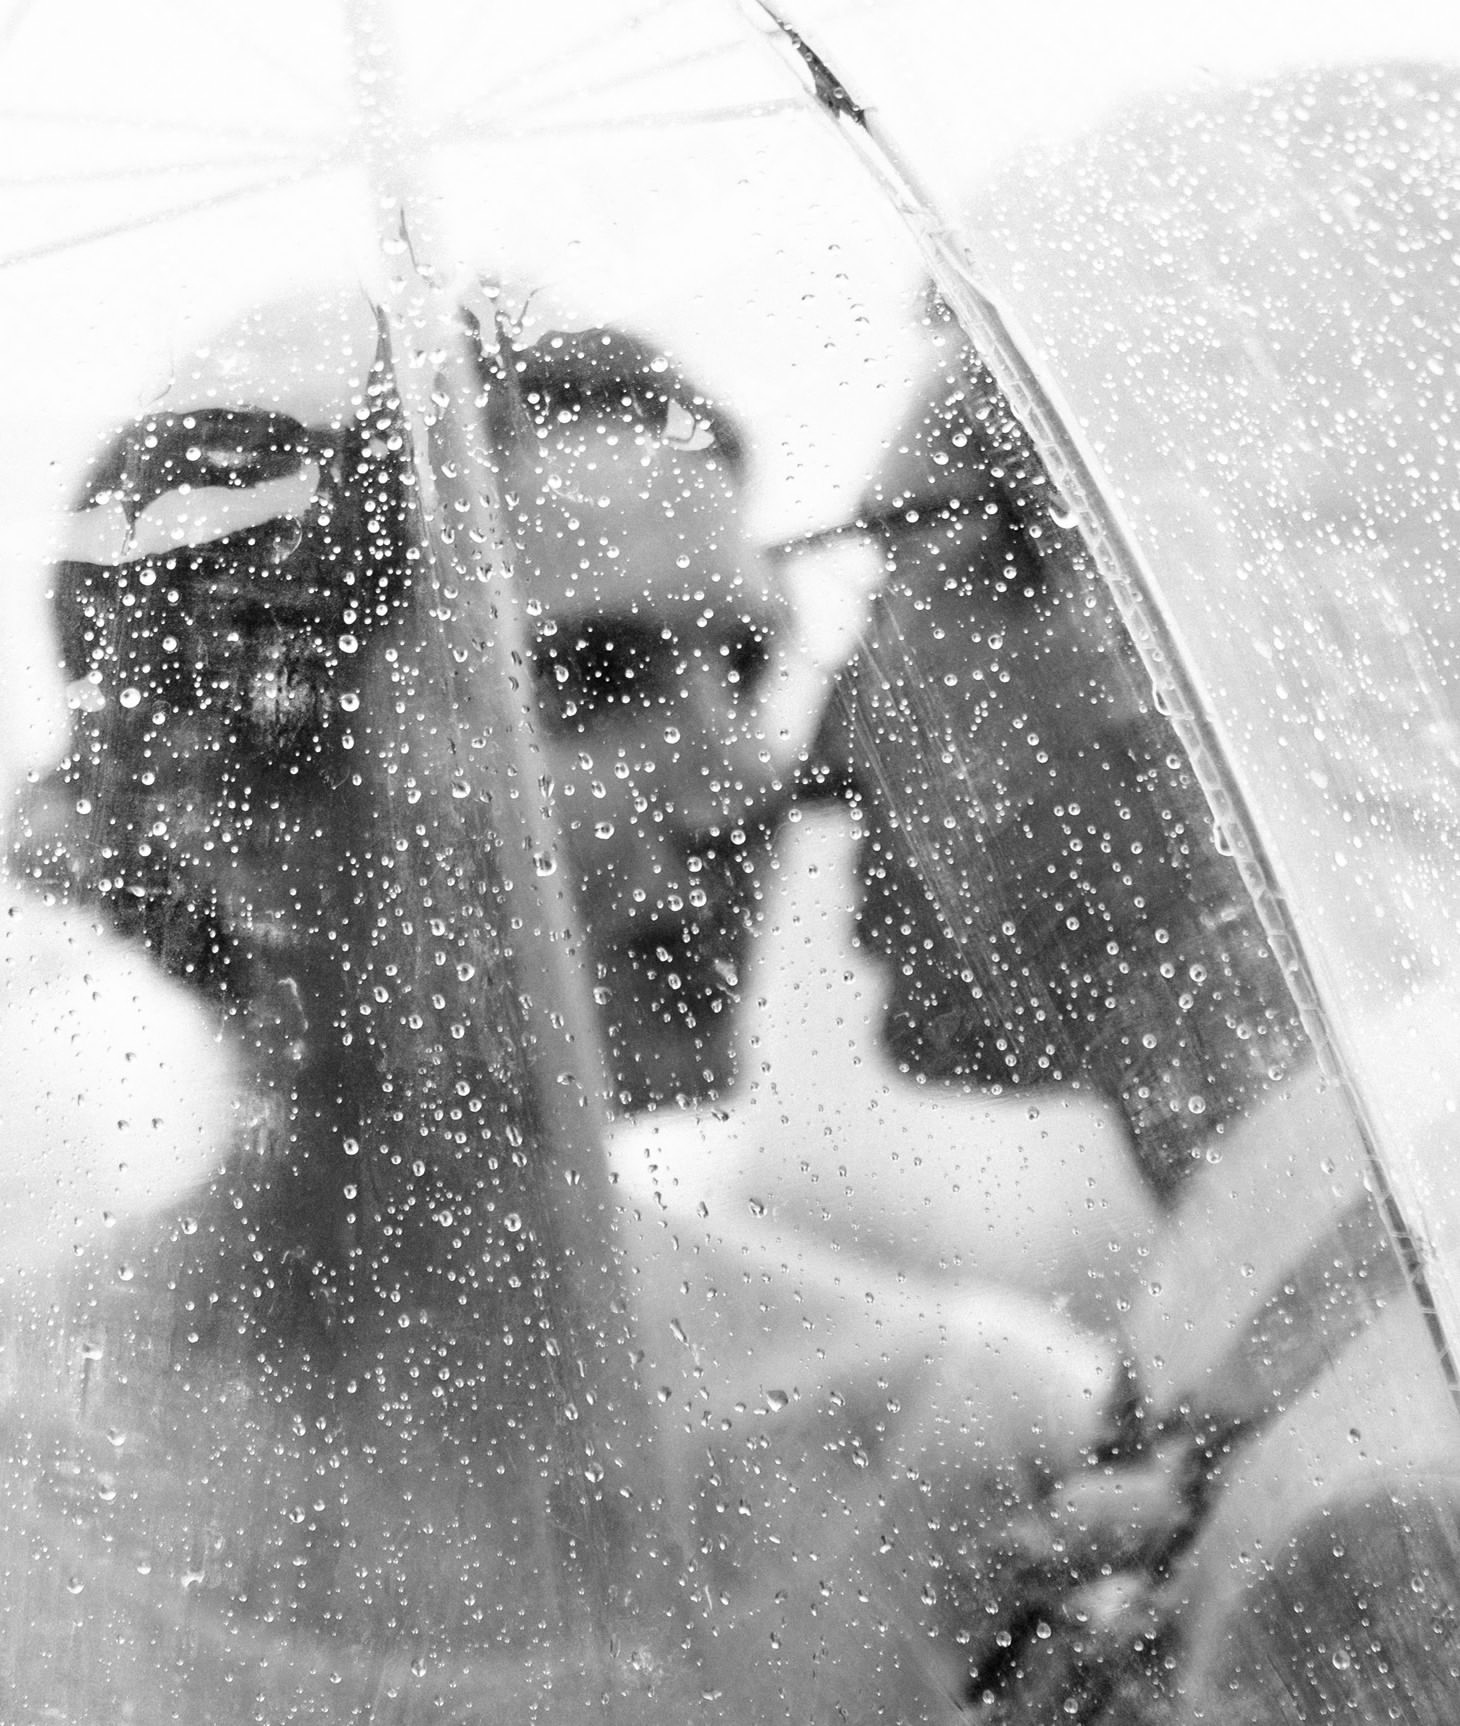 007-nyc-dumbo-loft-brooklyn-wedding-photographer-smitten-chickens-photo-.jpg